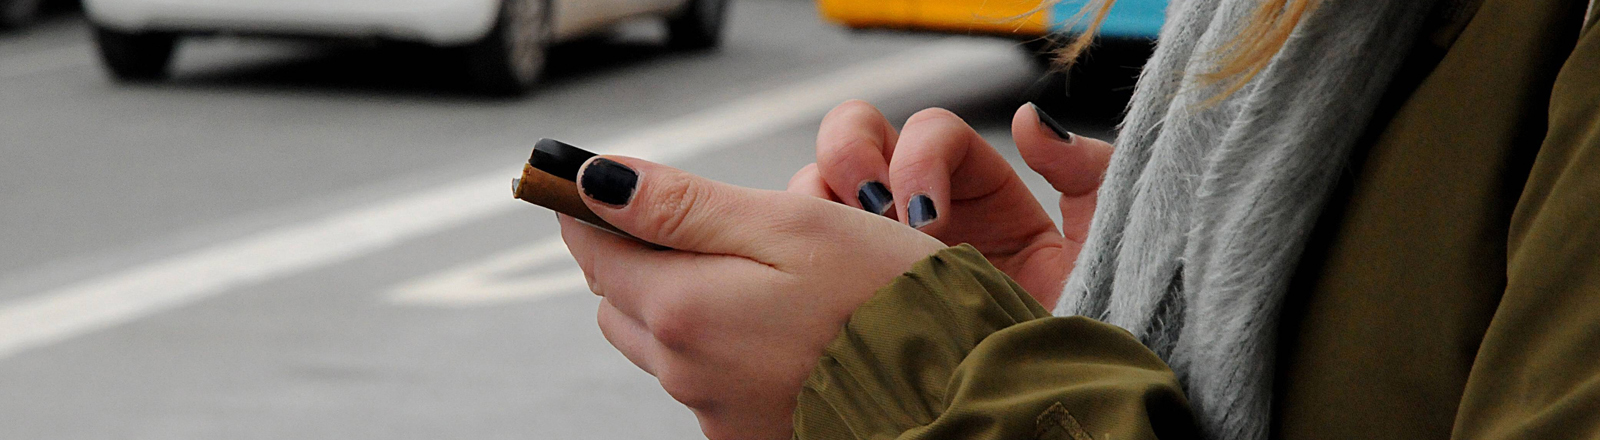 Frau mit Smartphone an Straße